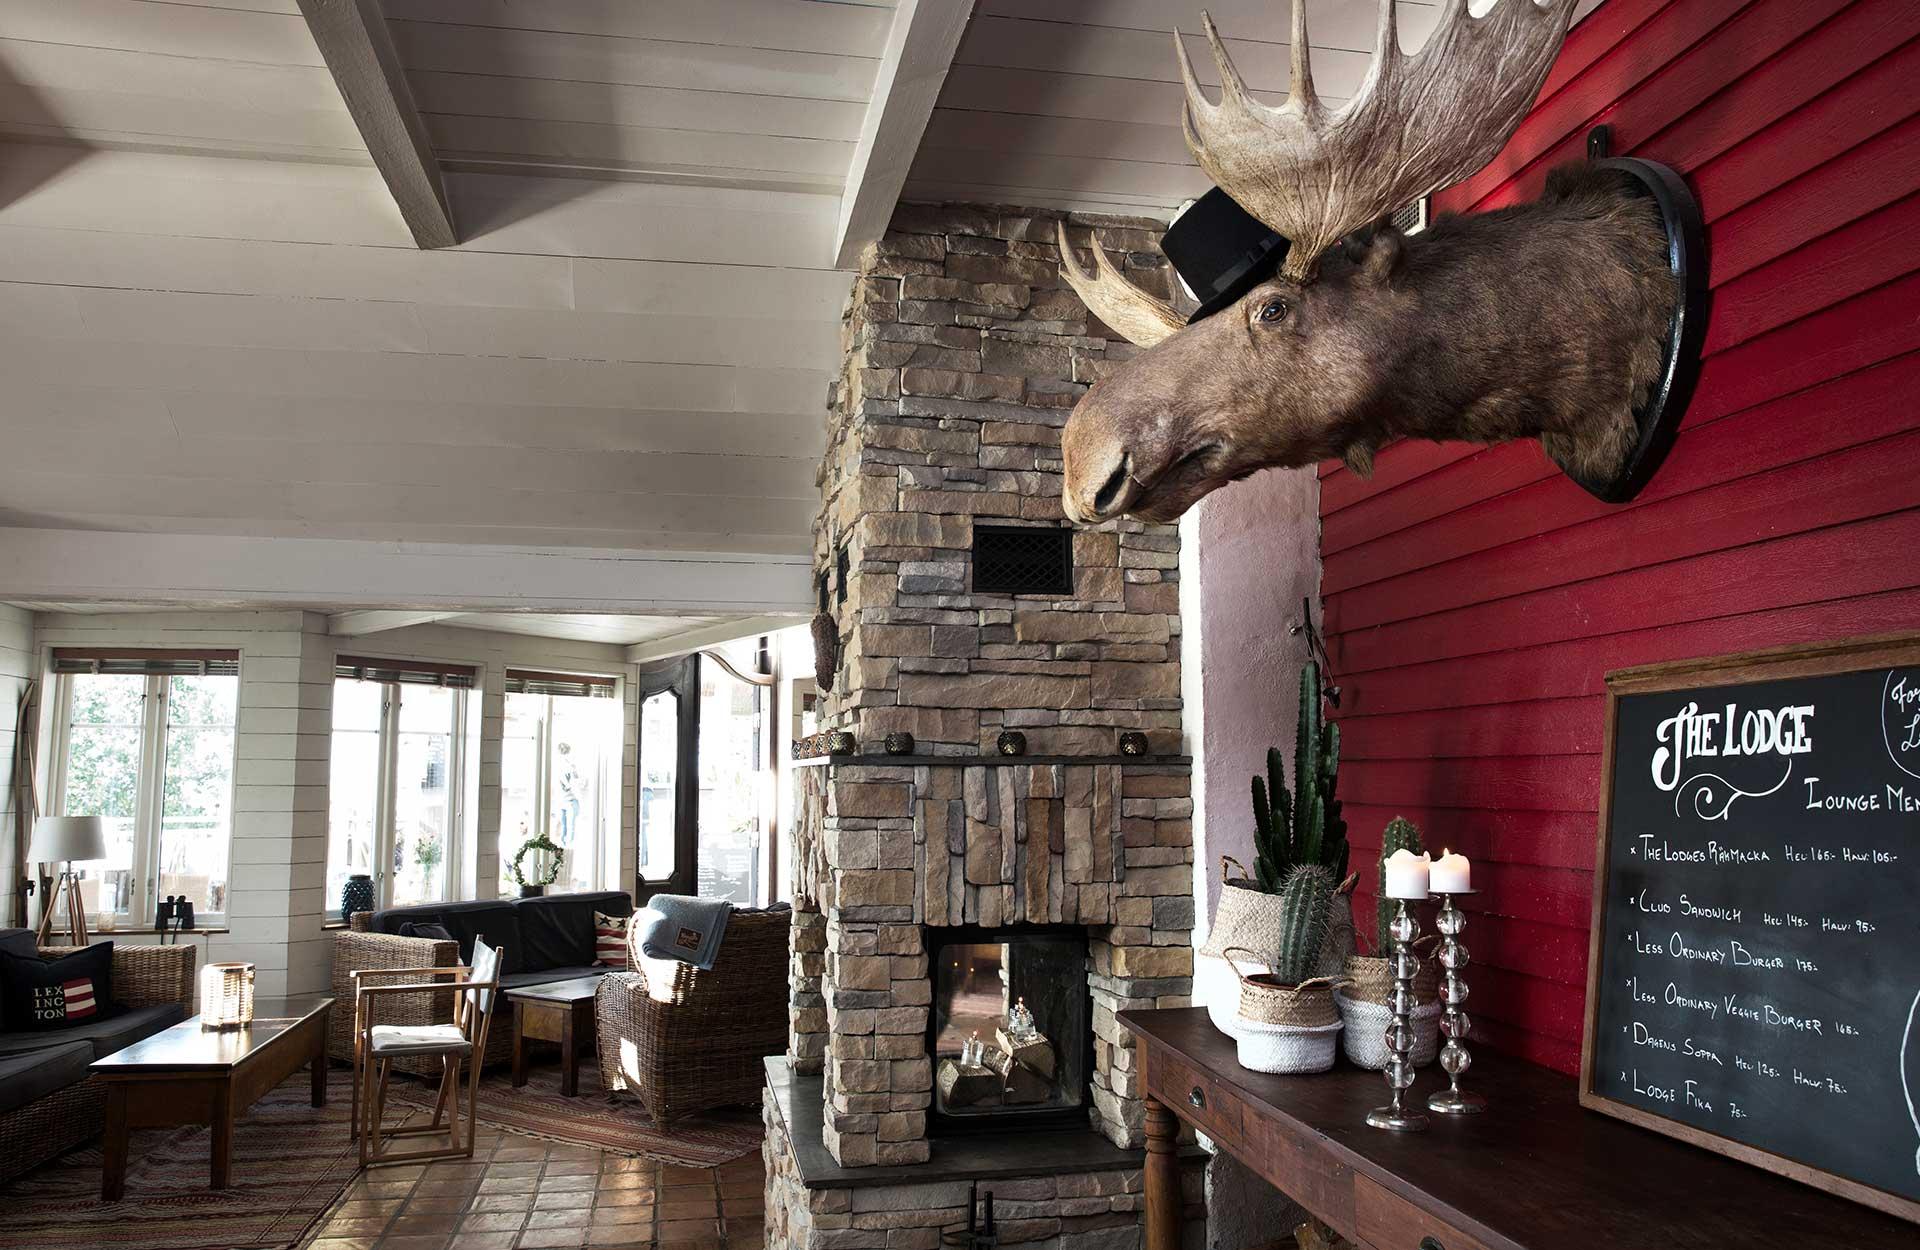 The Lodge SPA